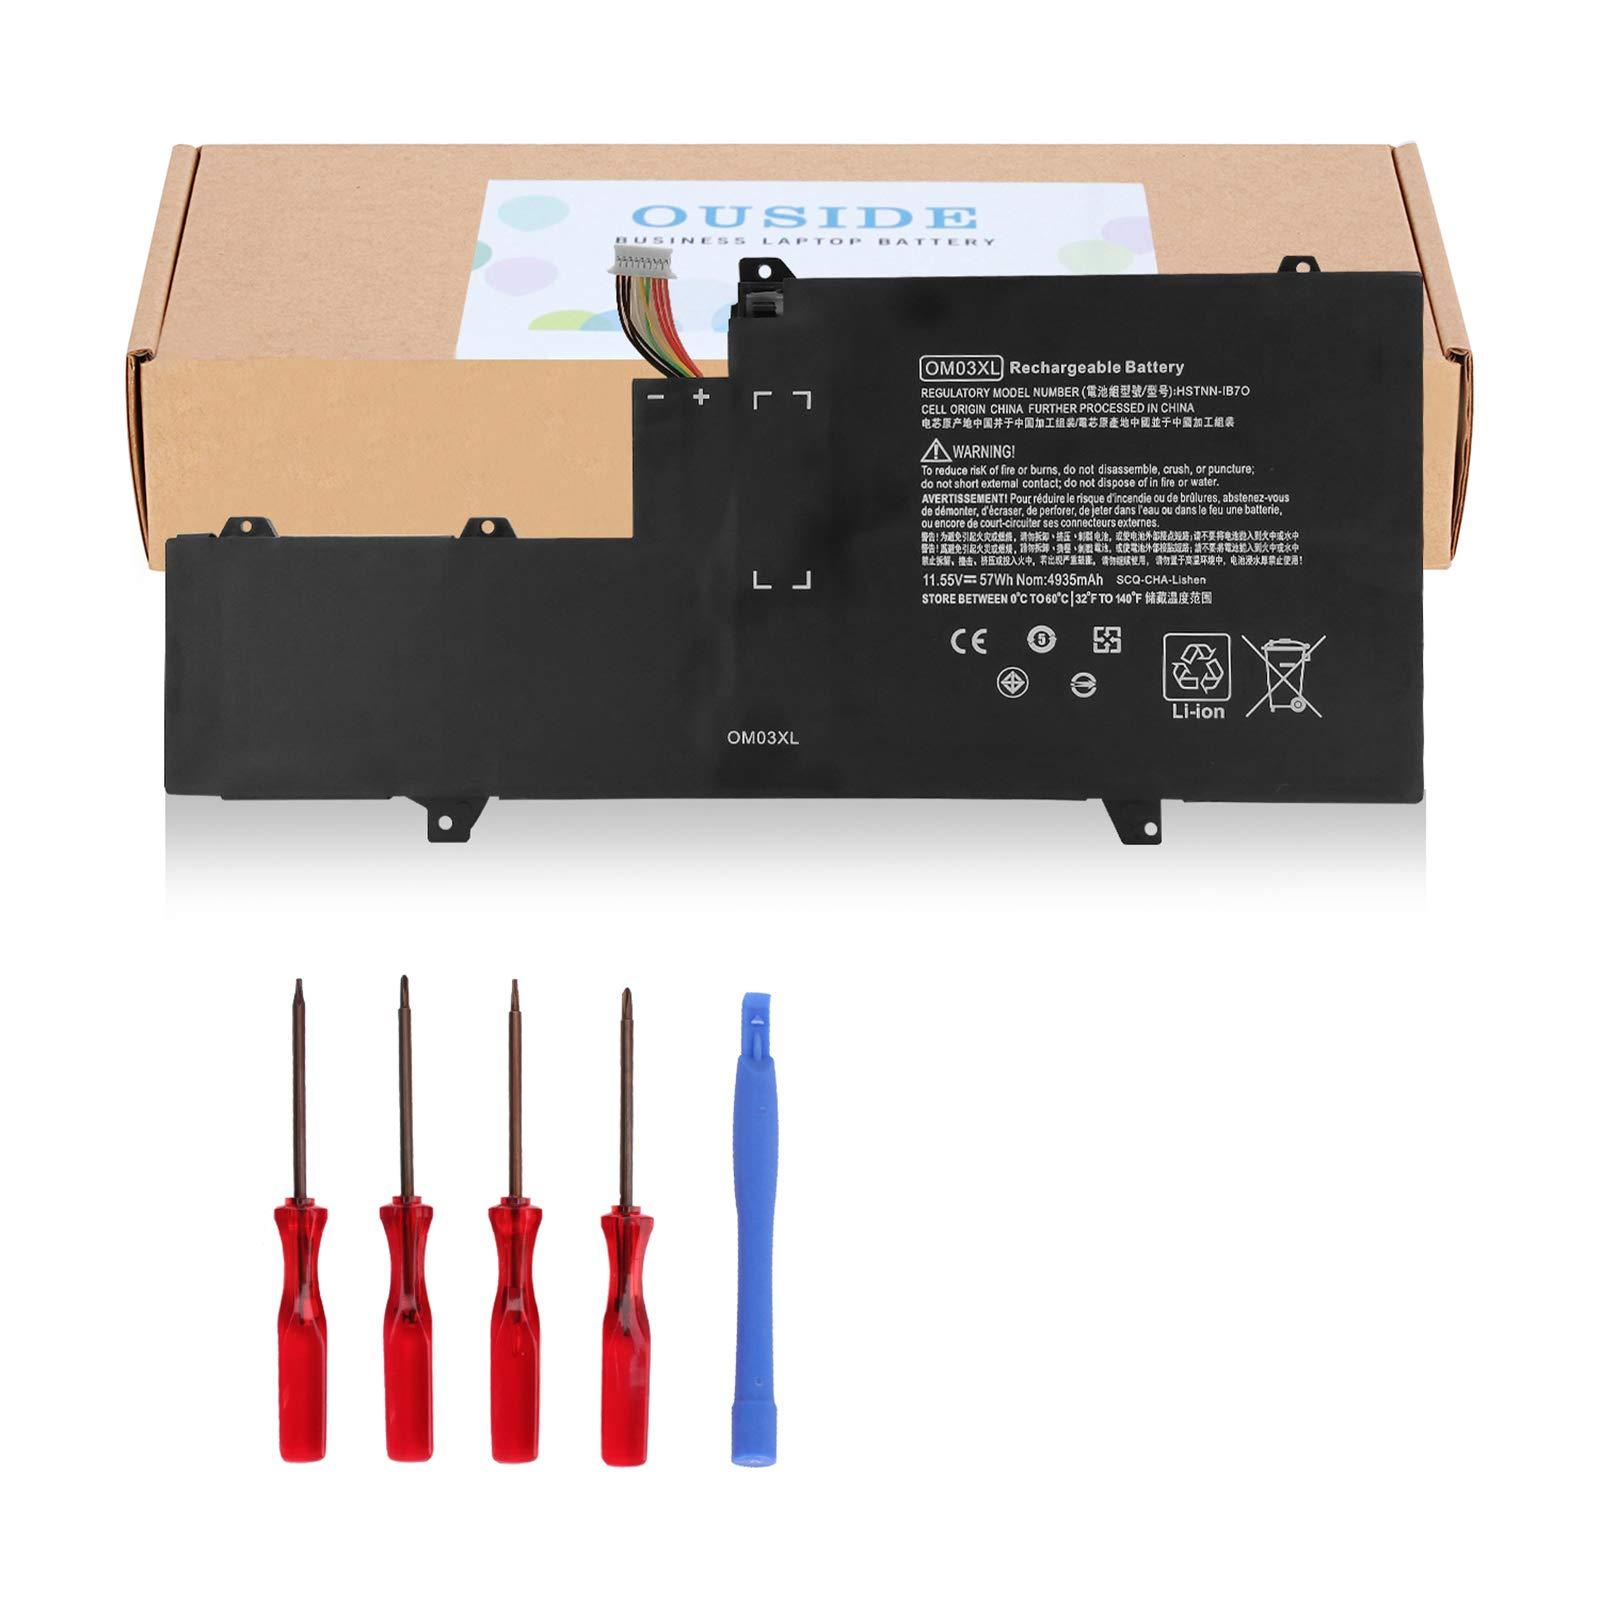 Bateria OM03XL para HP EliteBook X360 1030 G2 Series HSTNN-I